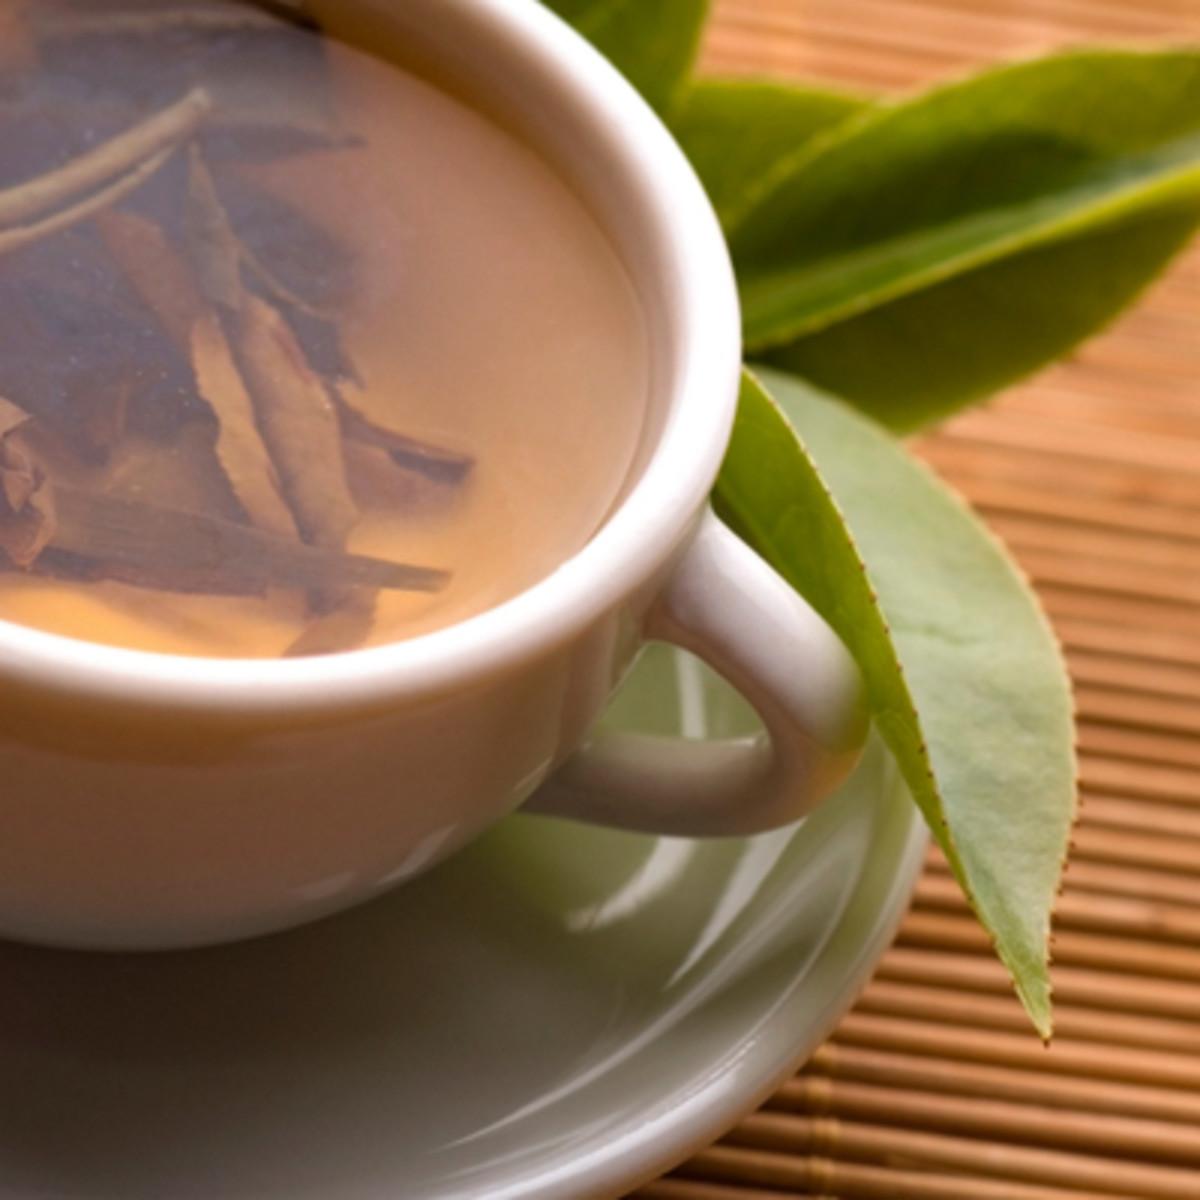 Green tea brewed from loose tea leaves.